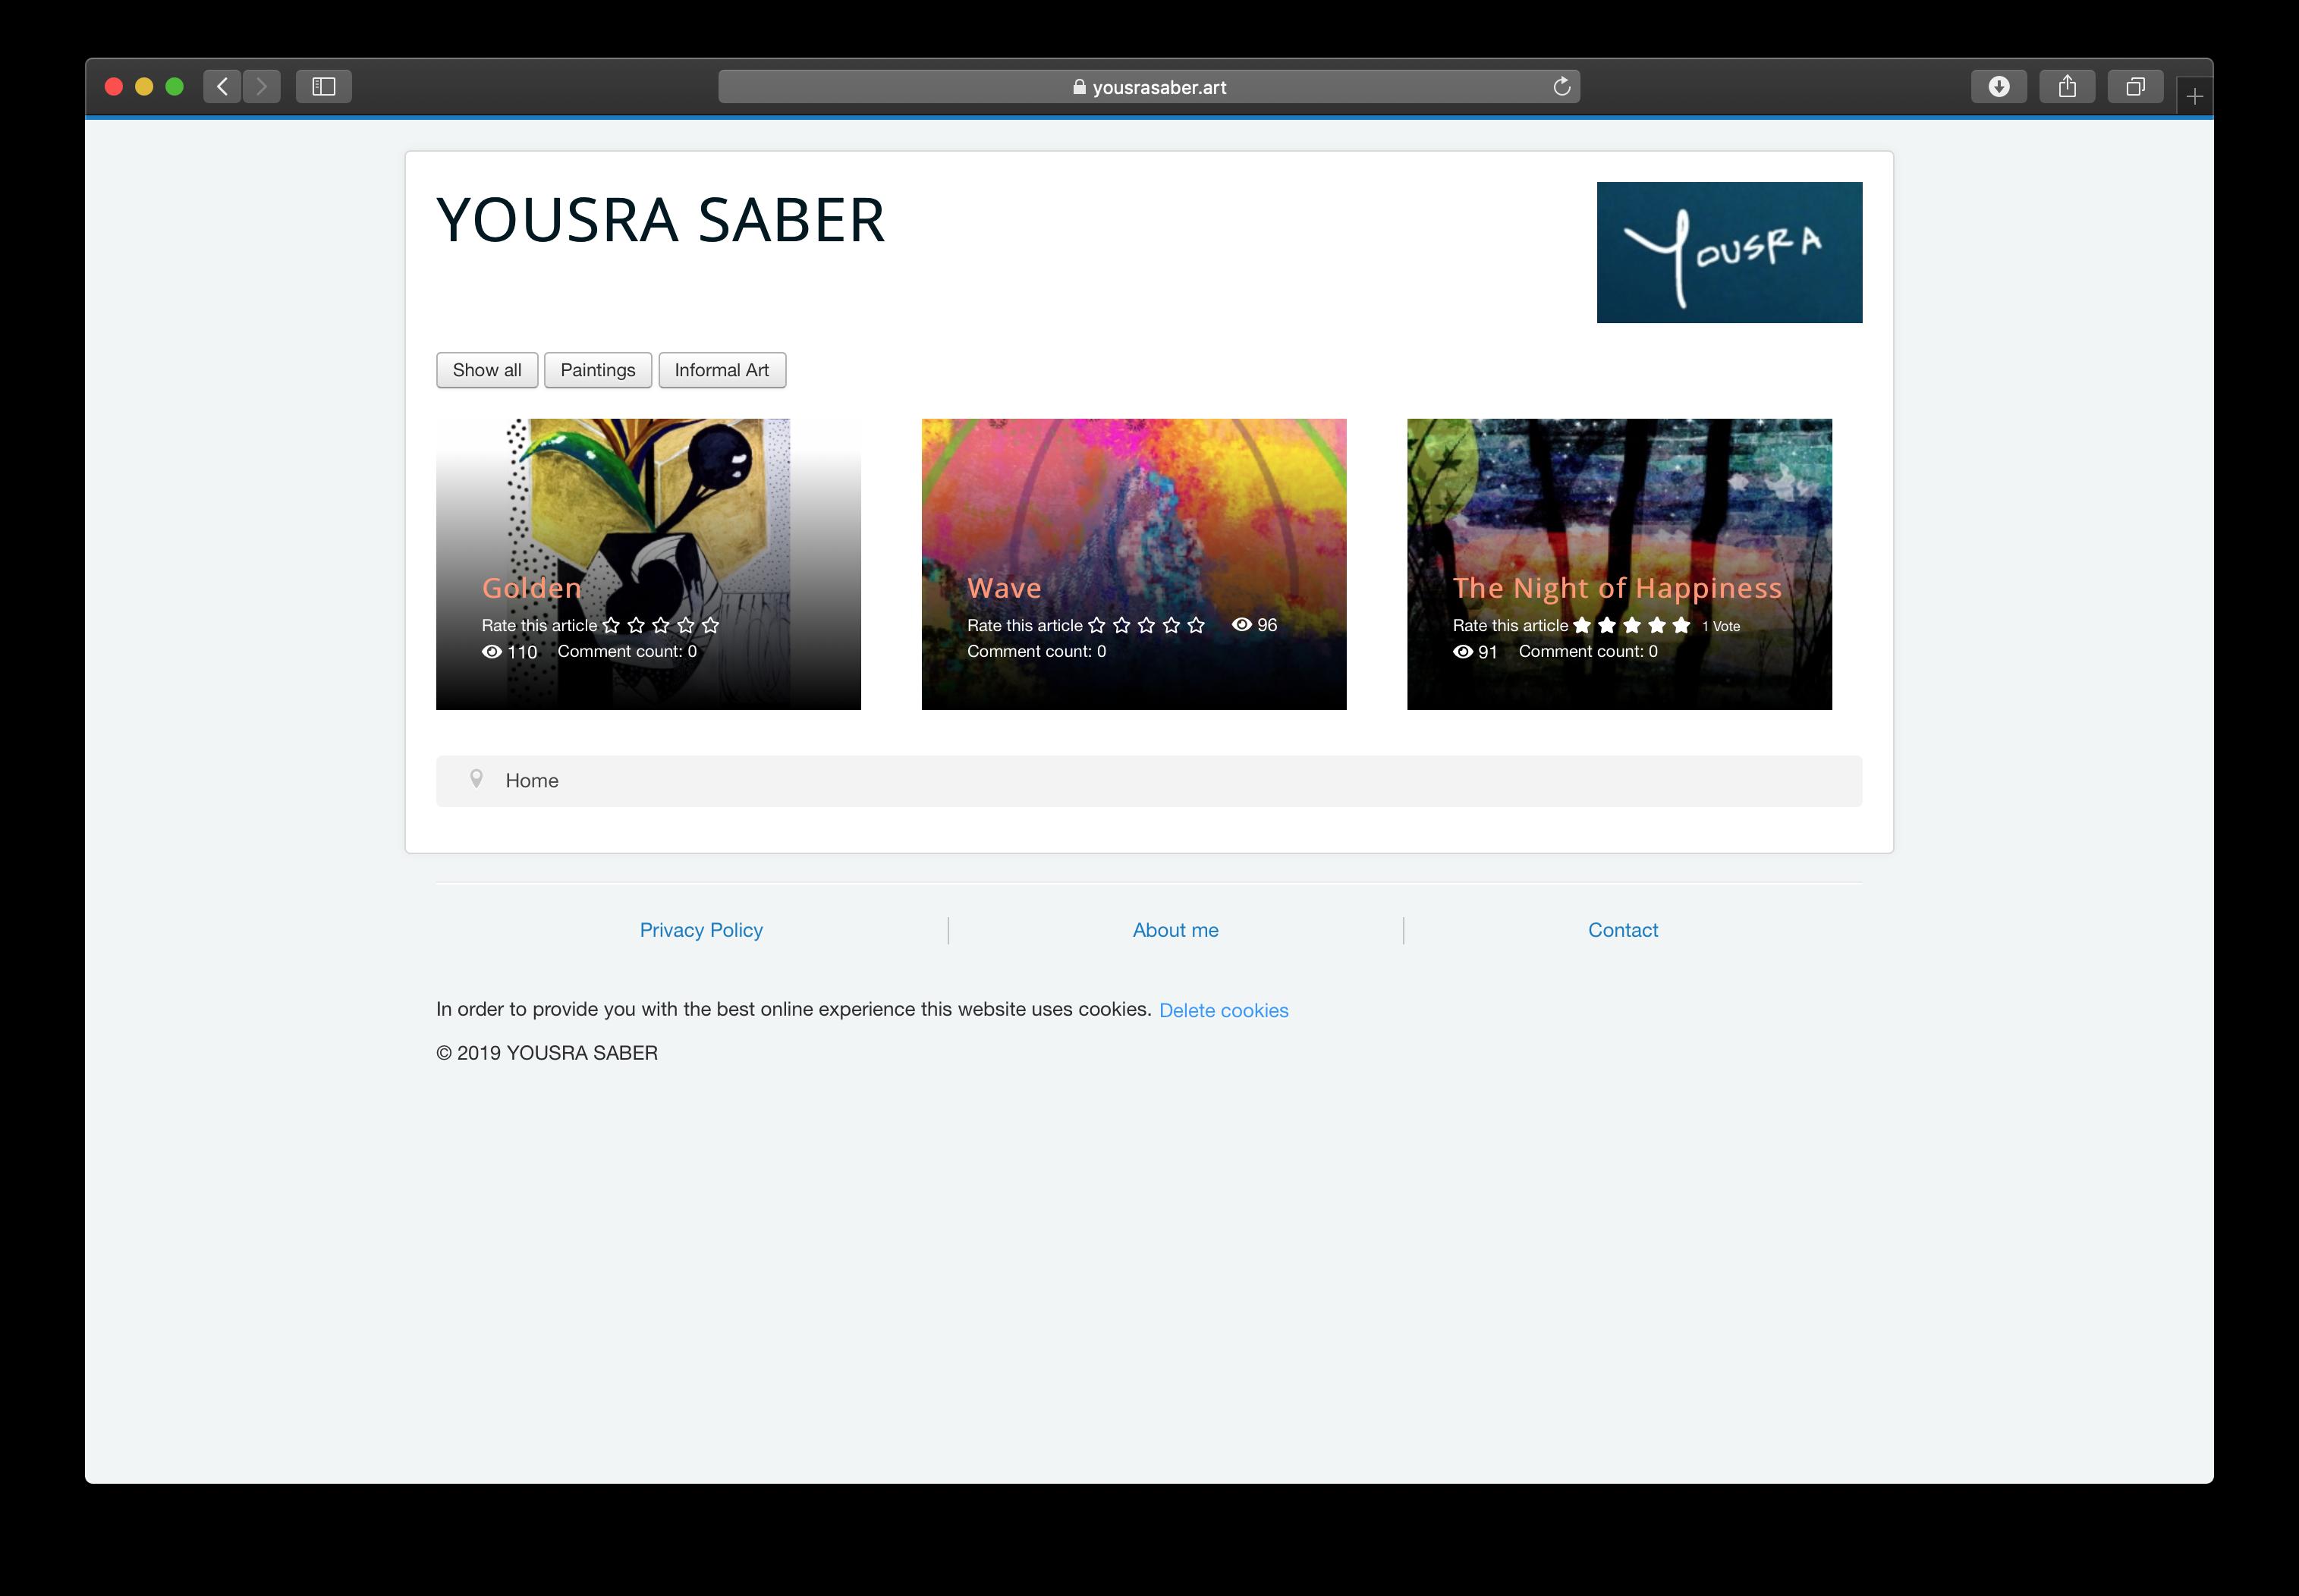 Yousra Saber